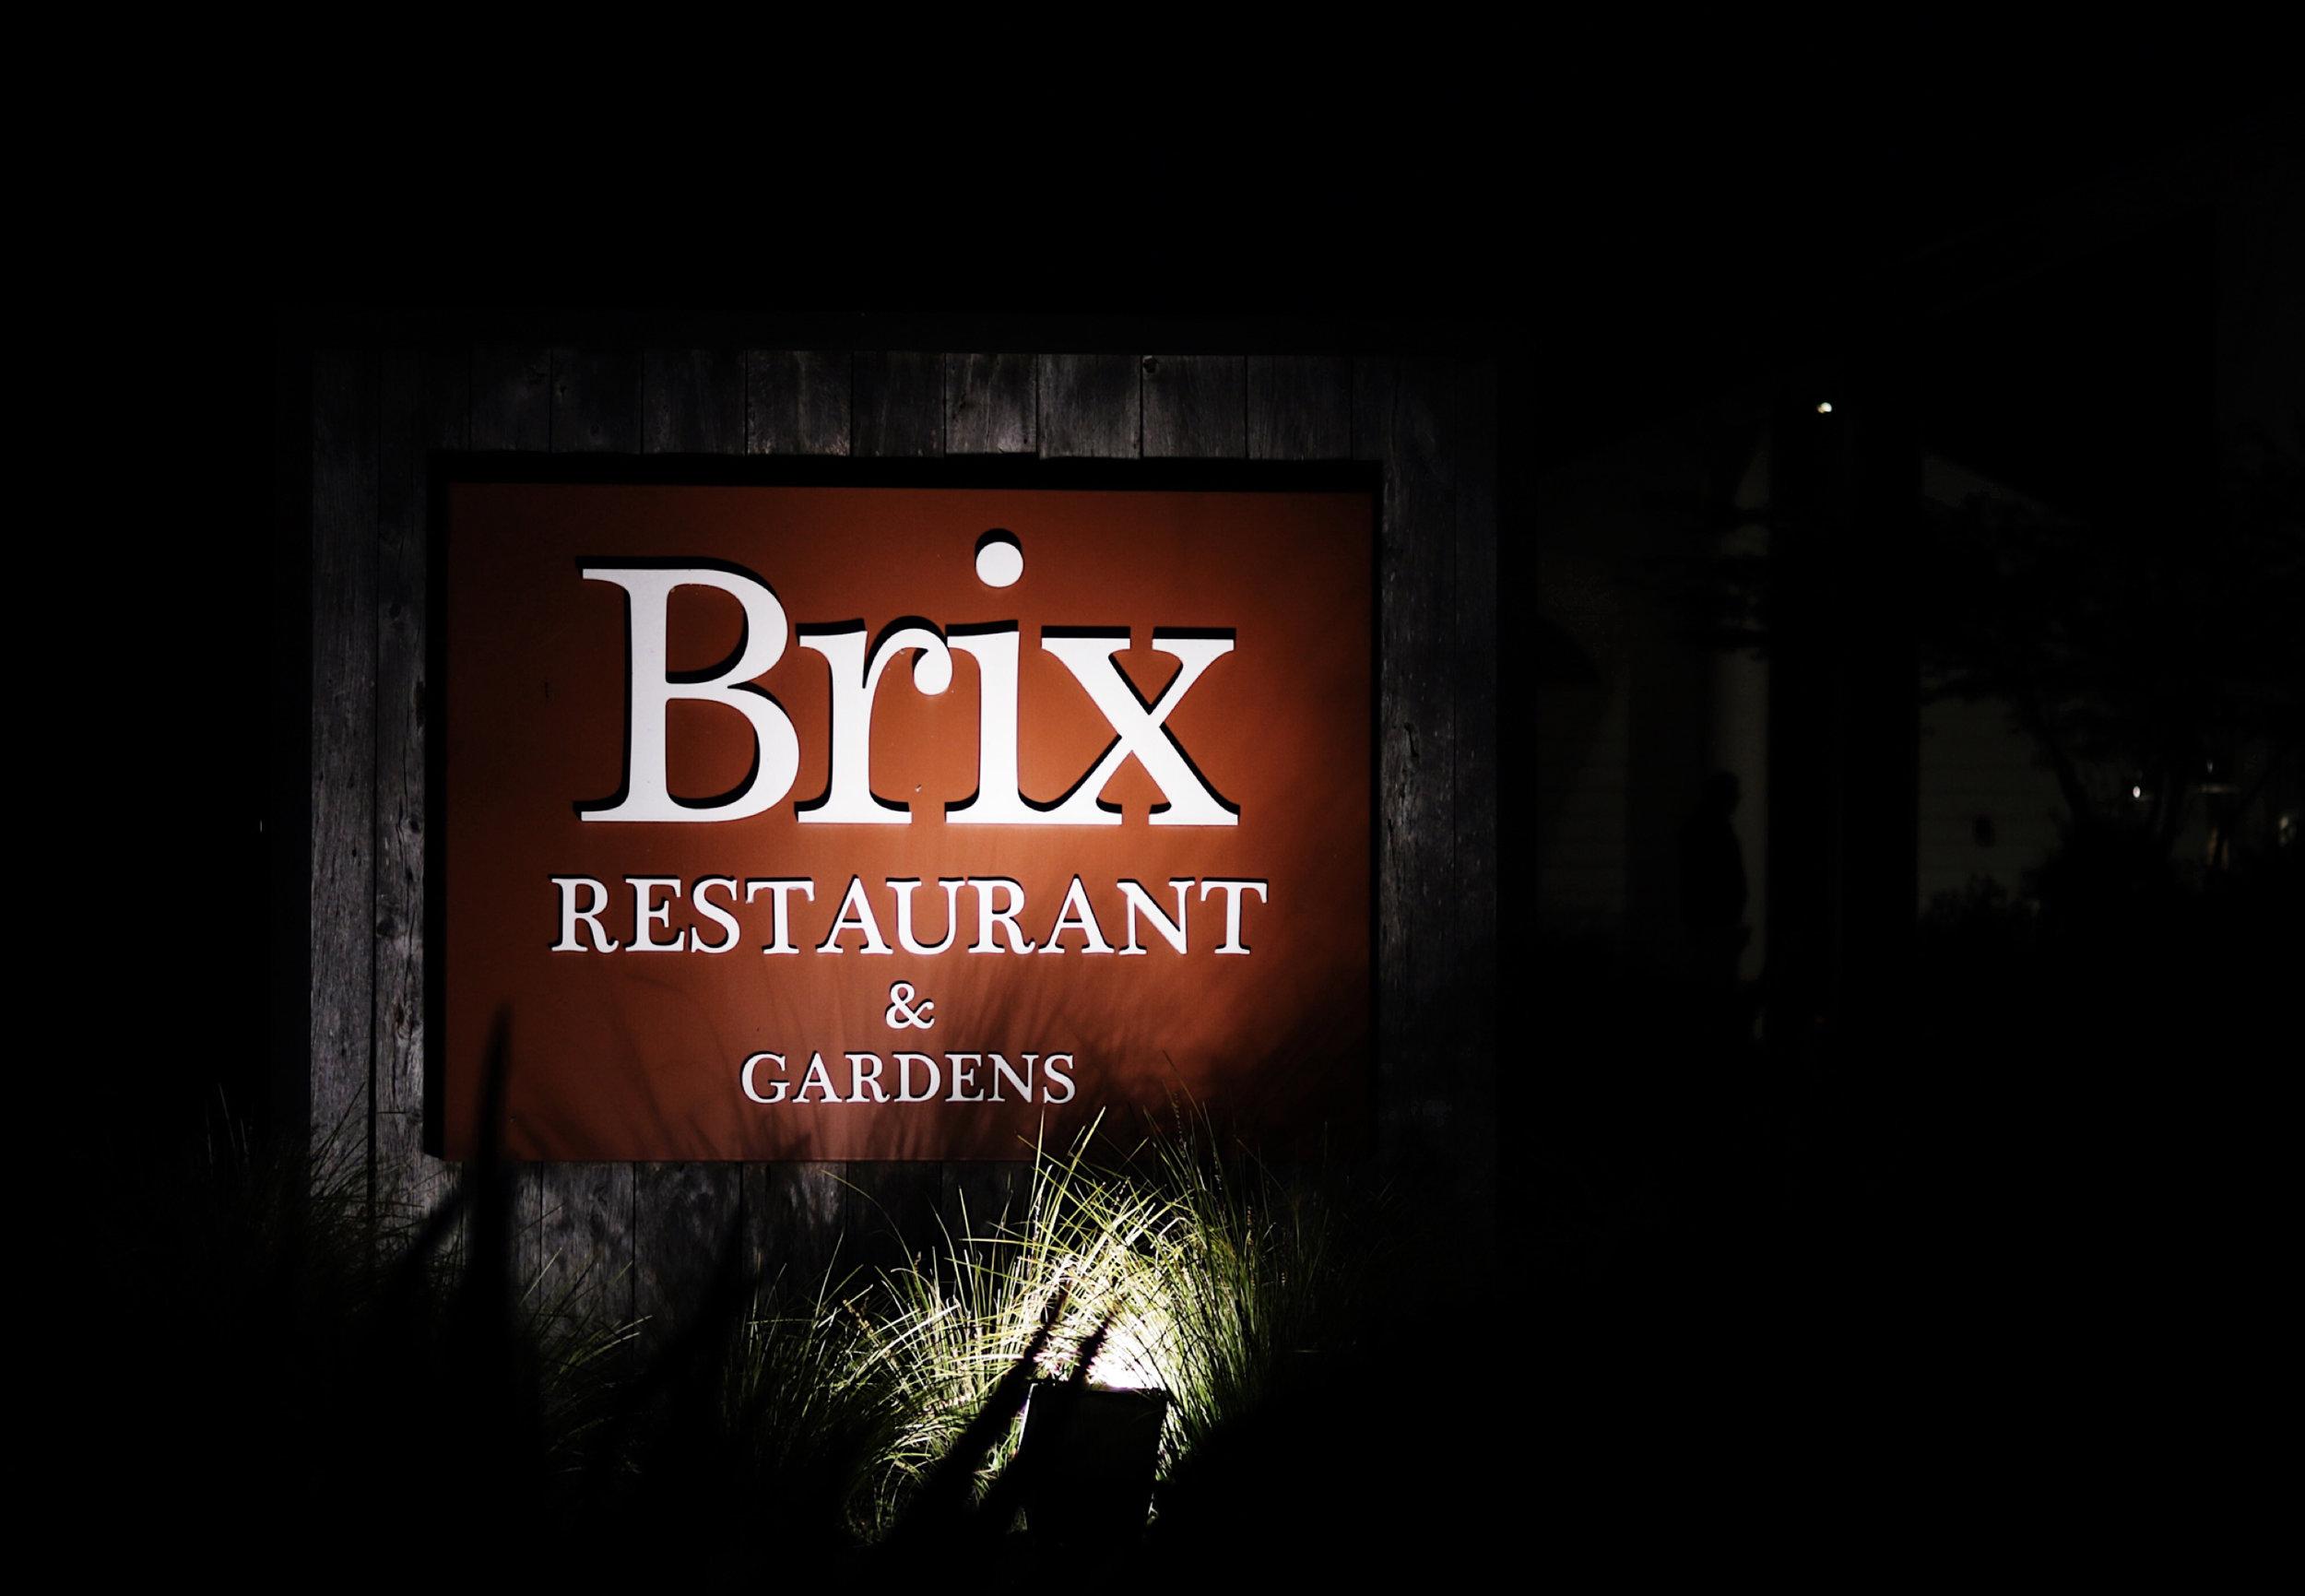 Brix - 7377 St. Helena Hwy, Napa, CA 94558